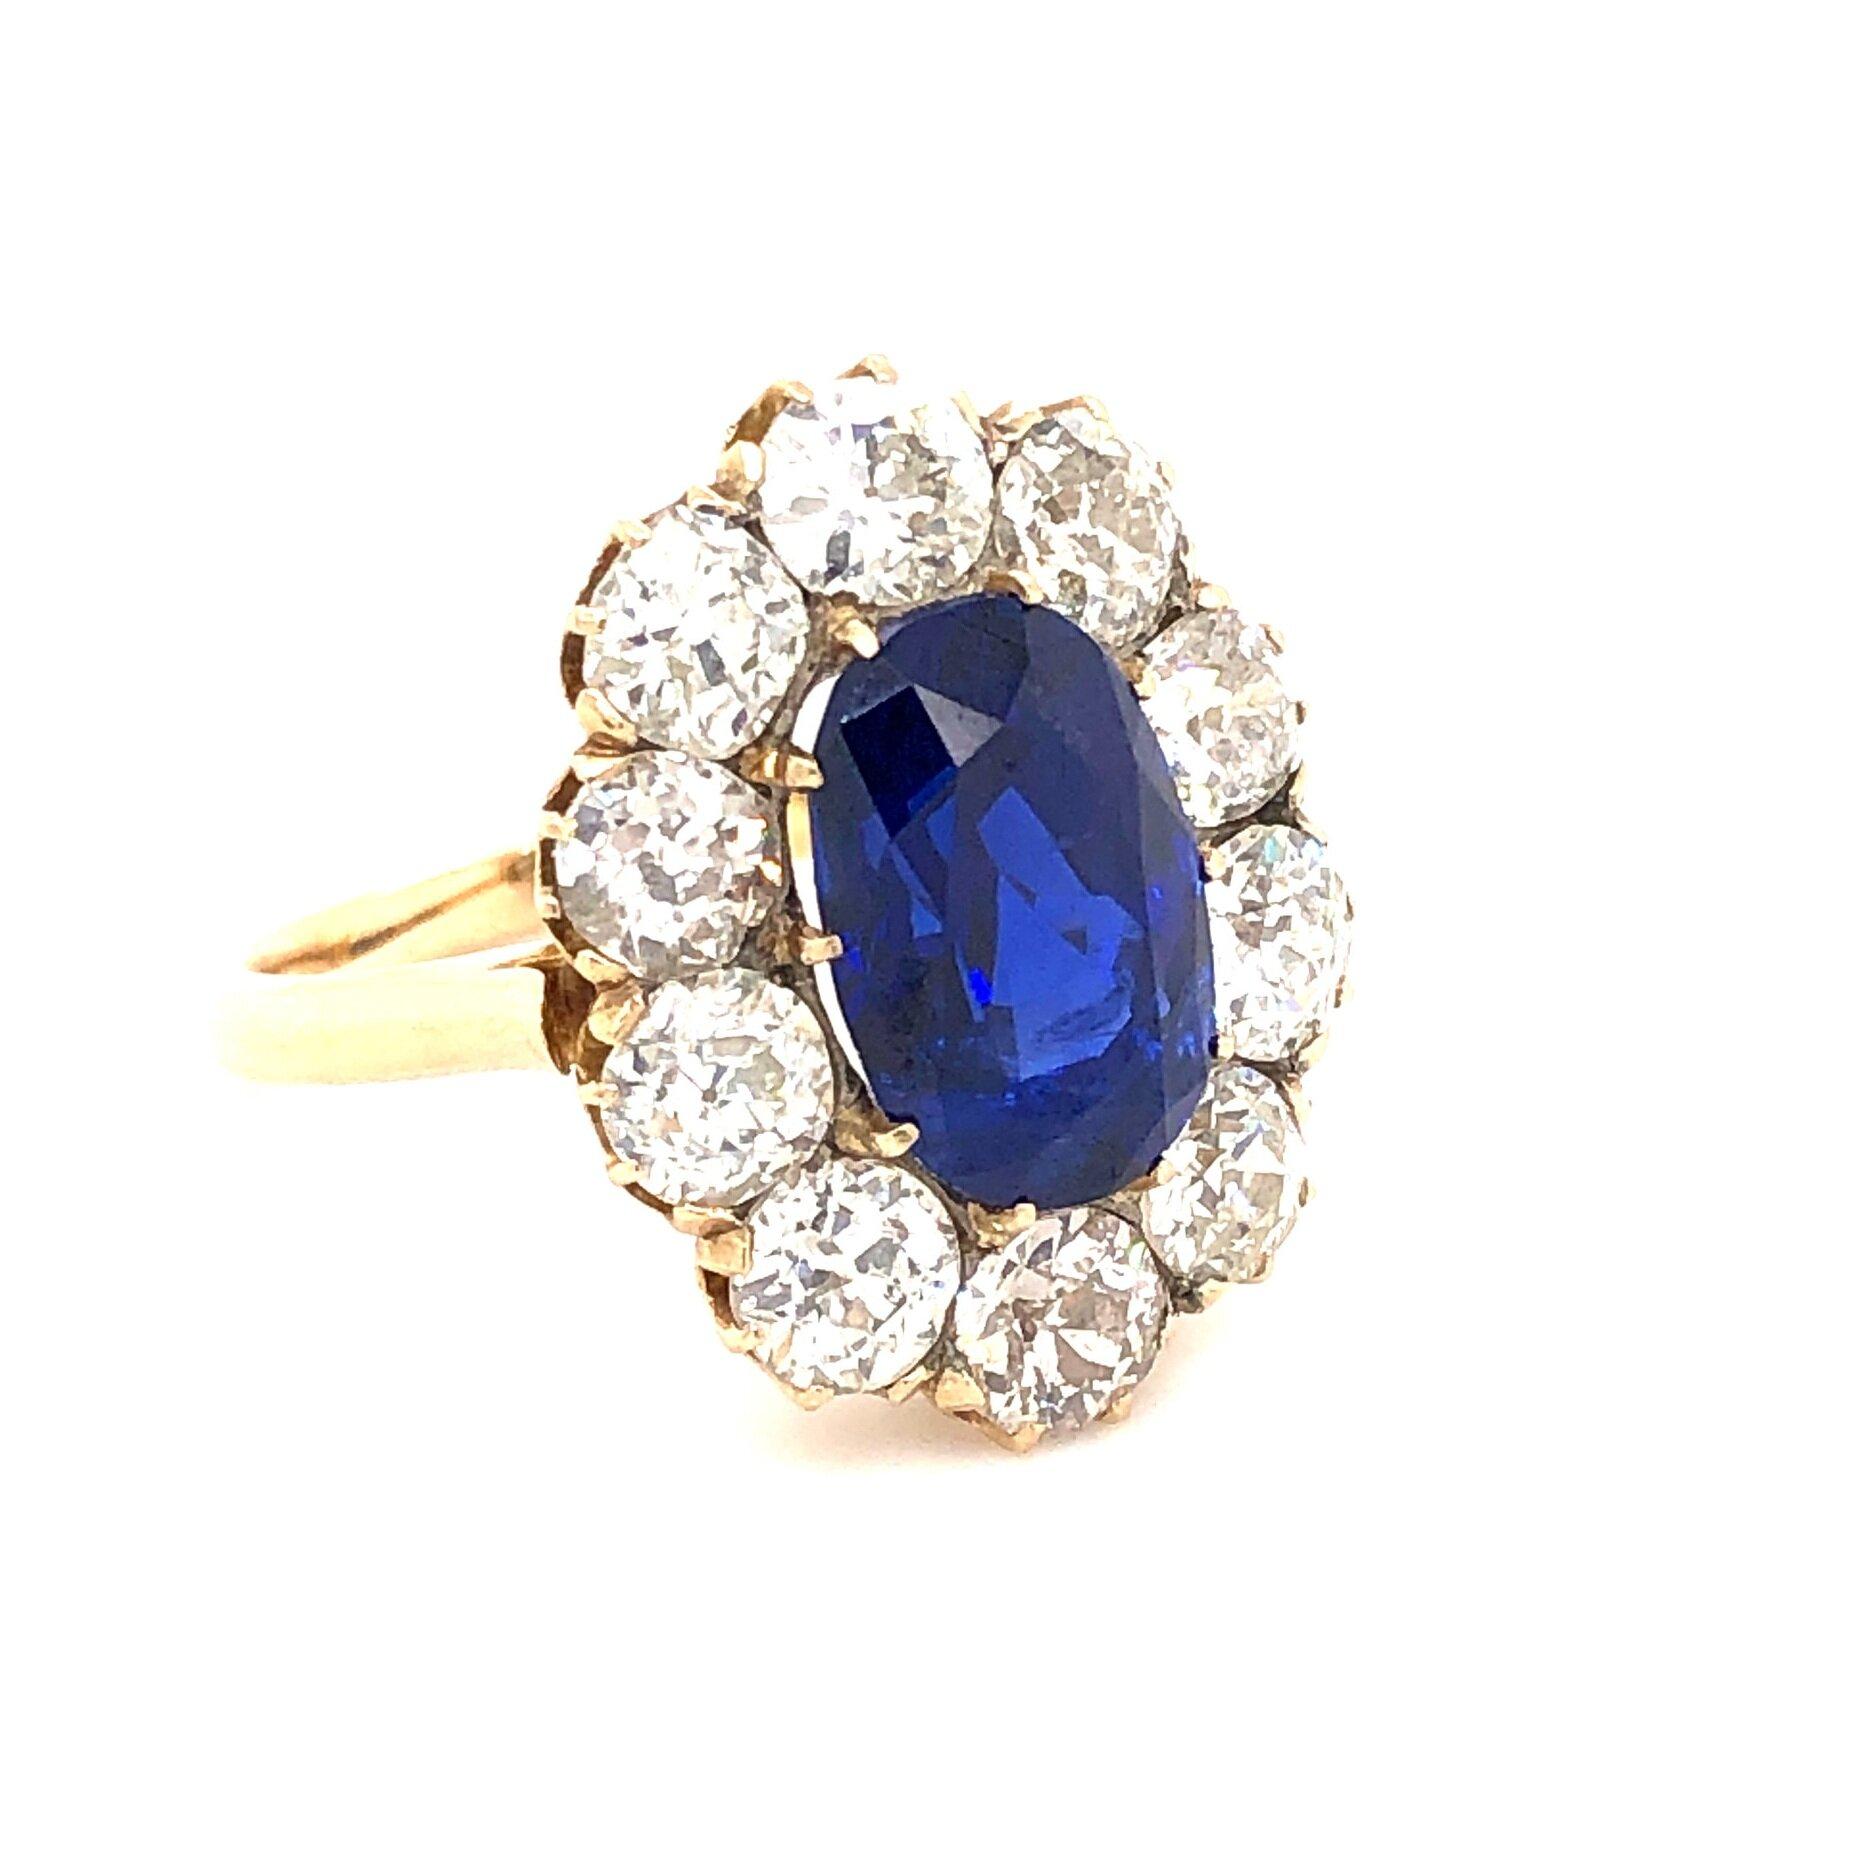 Sapphire Ring  Est. US$ 32,000-35,000